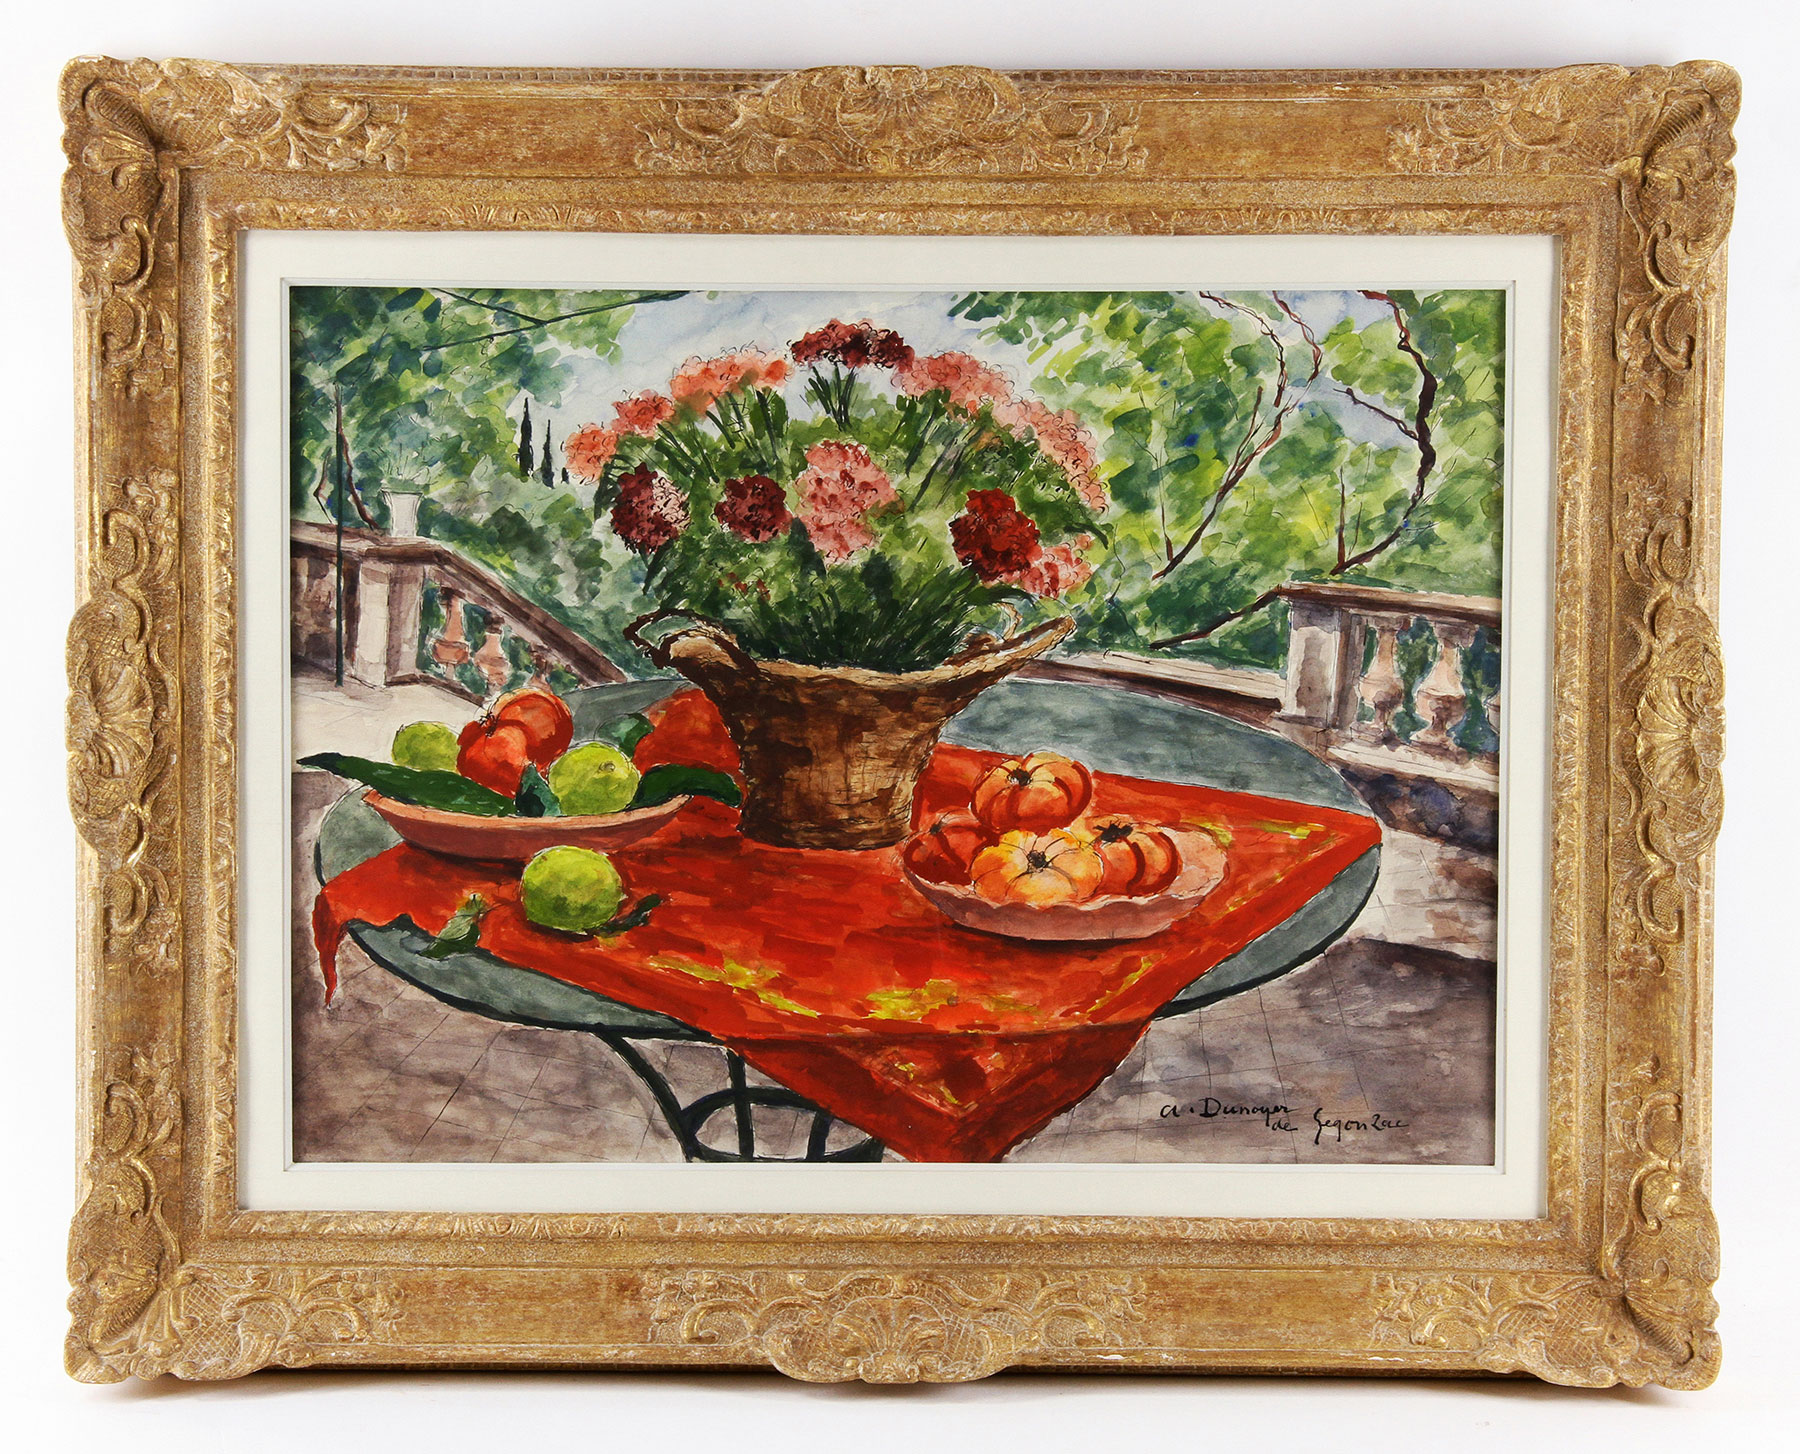 Kaminski Auctions Presents the Estate of Baroness Mary McFall de ... - PR Web (press release)